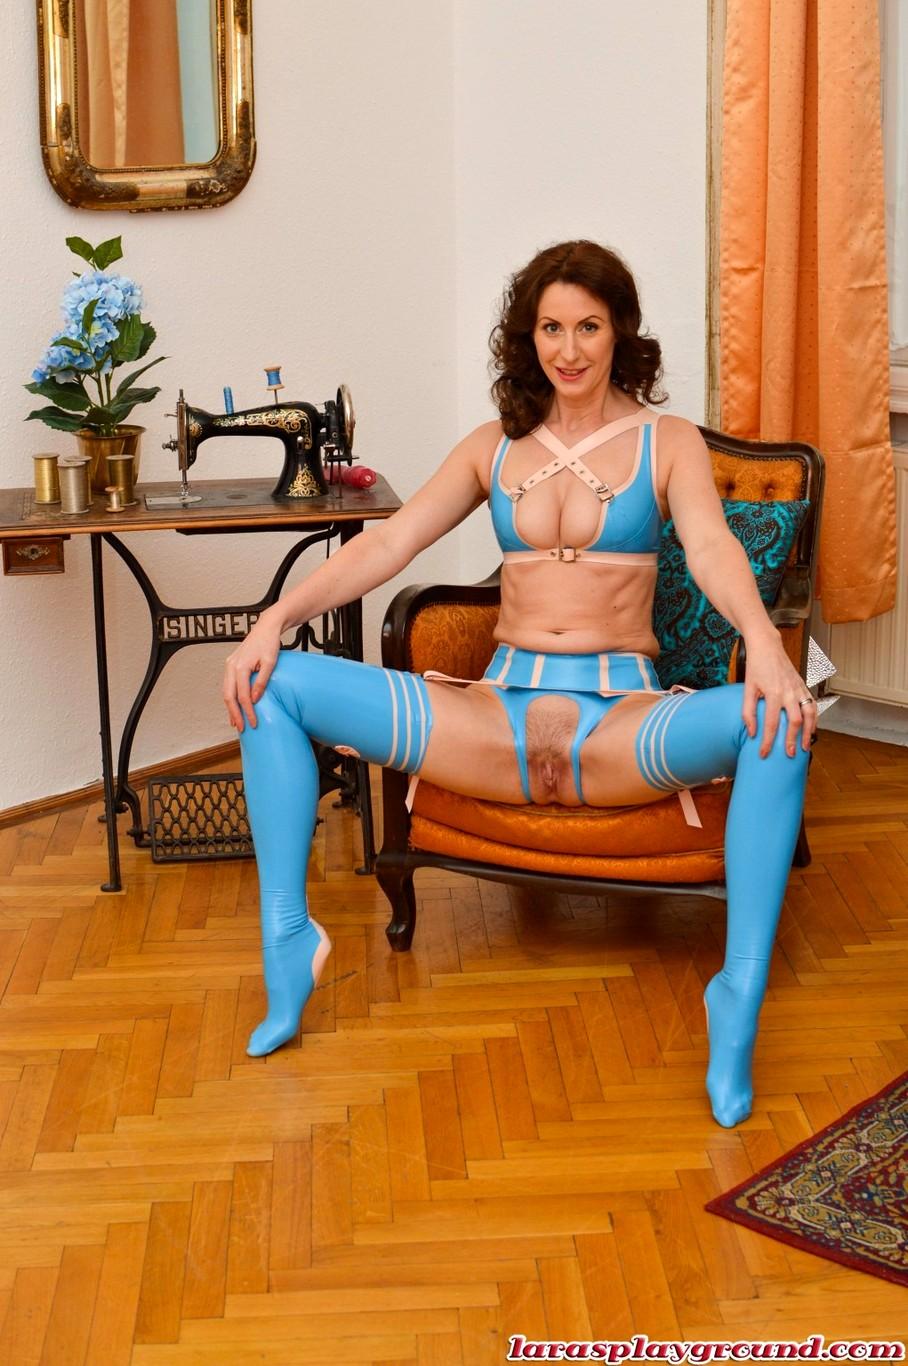 lara splayground lara latex rounbrown real tits gallery hottest free